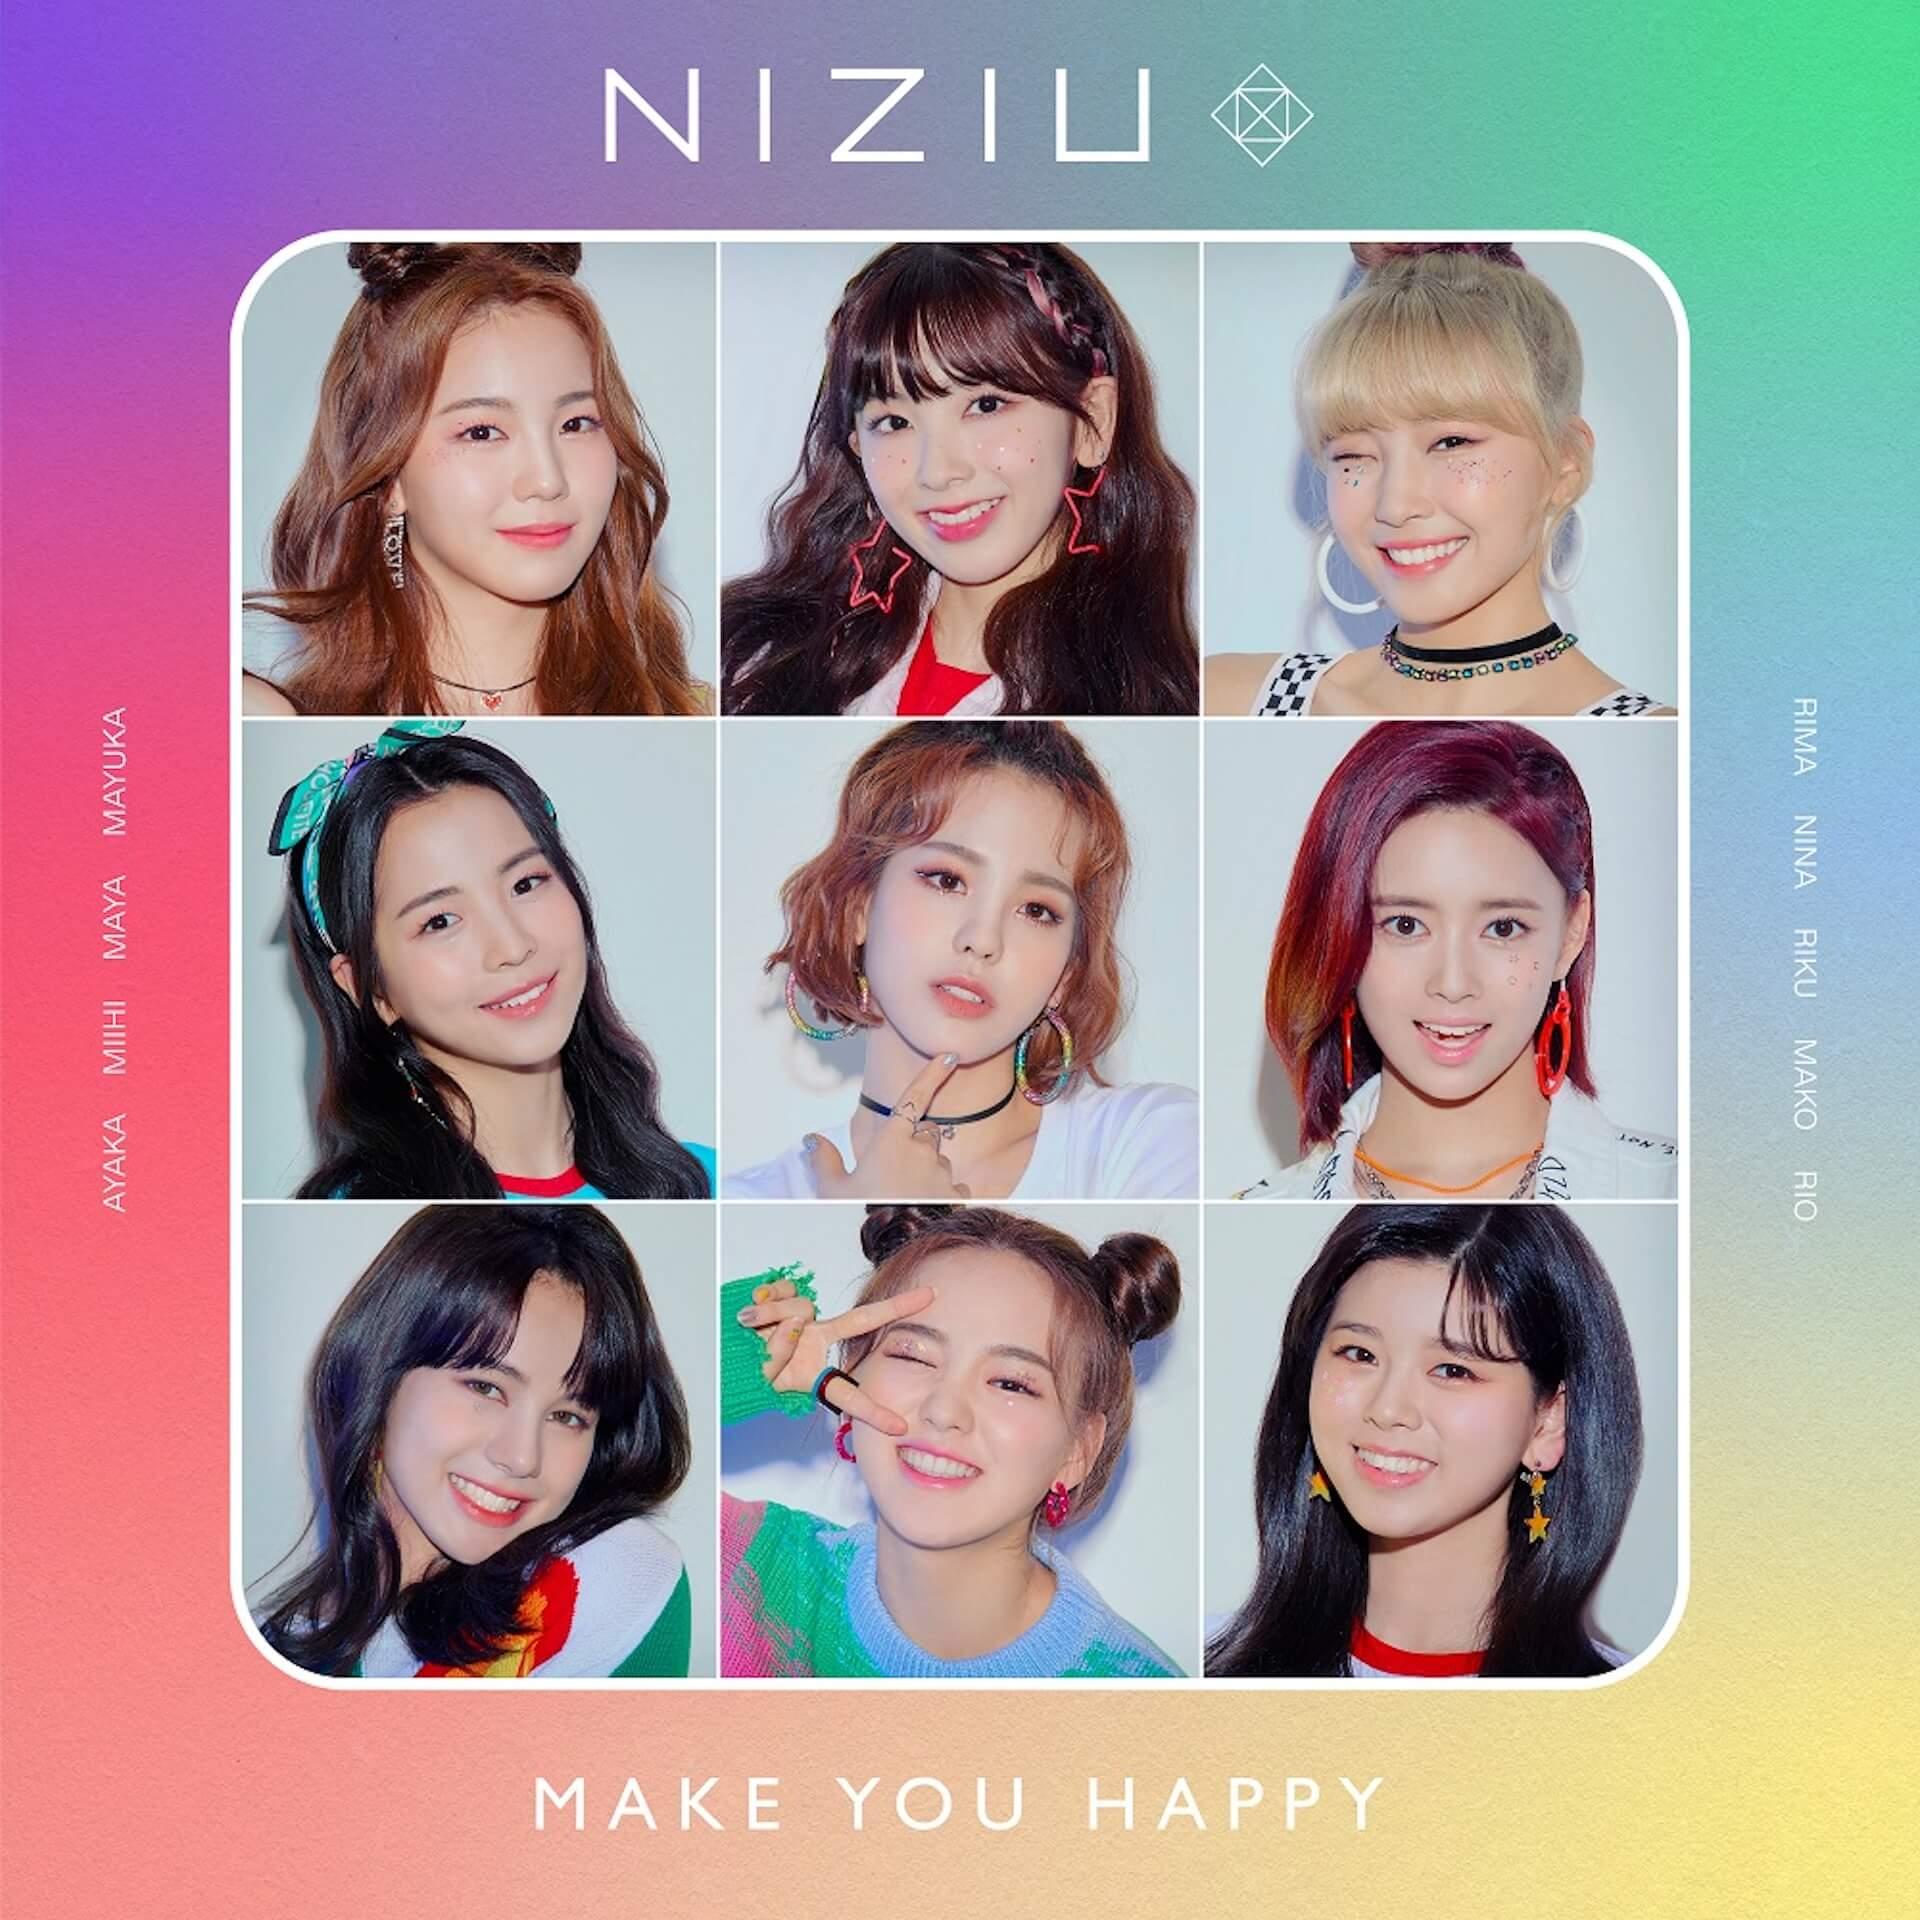 NiziU、プレデビューアルバム『Make you happy』&MVを初解禁!ファンクラブ「WithU」も明日始動 music200630_niziu_5